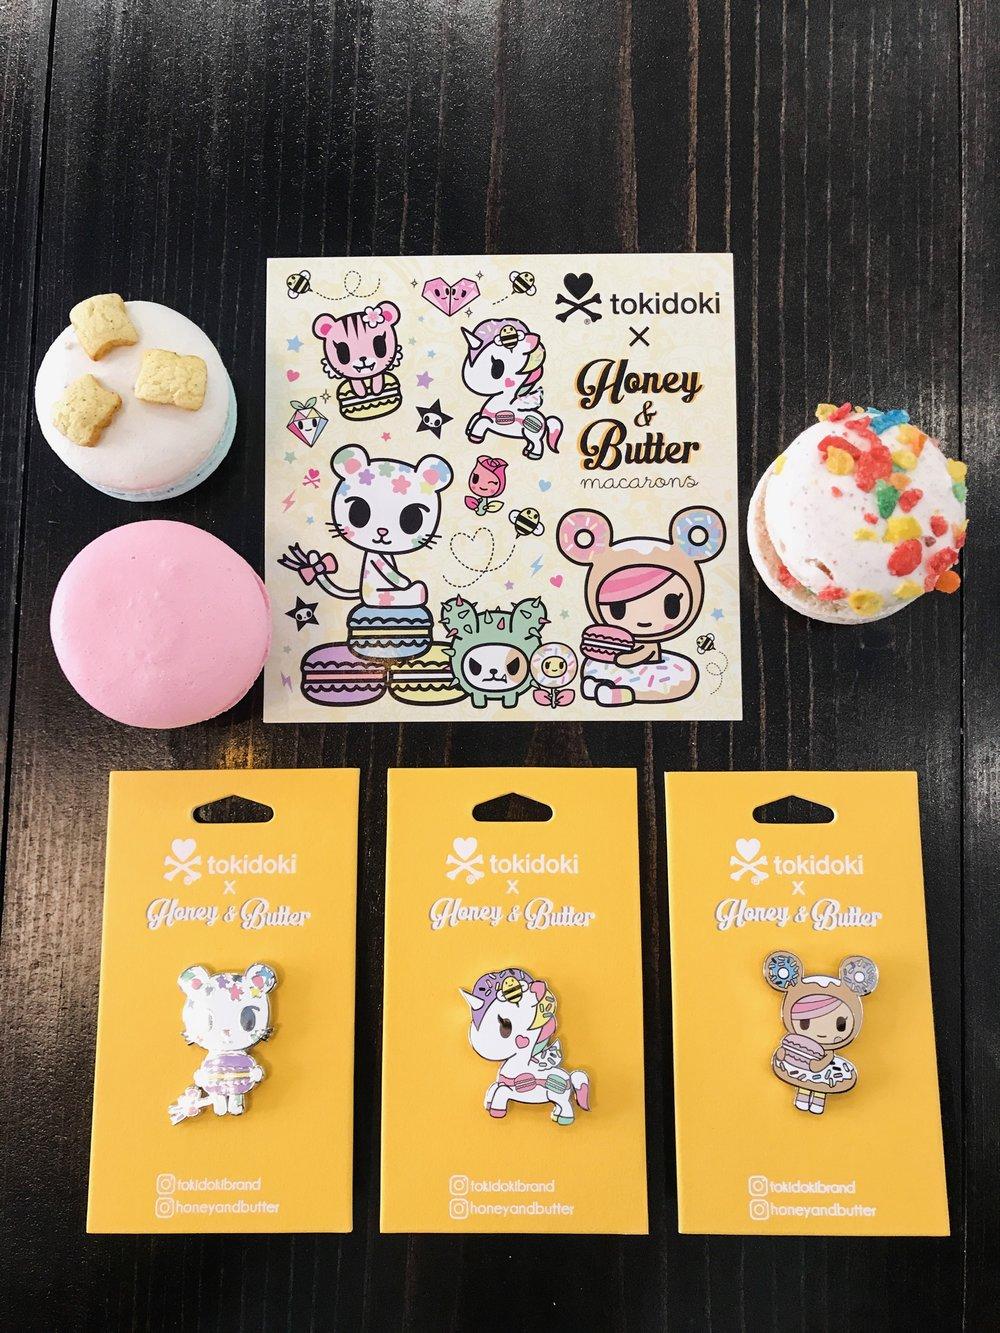 Tokidoki x Honey & Butter Pin Production Management